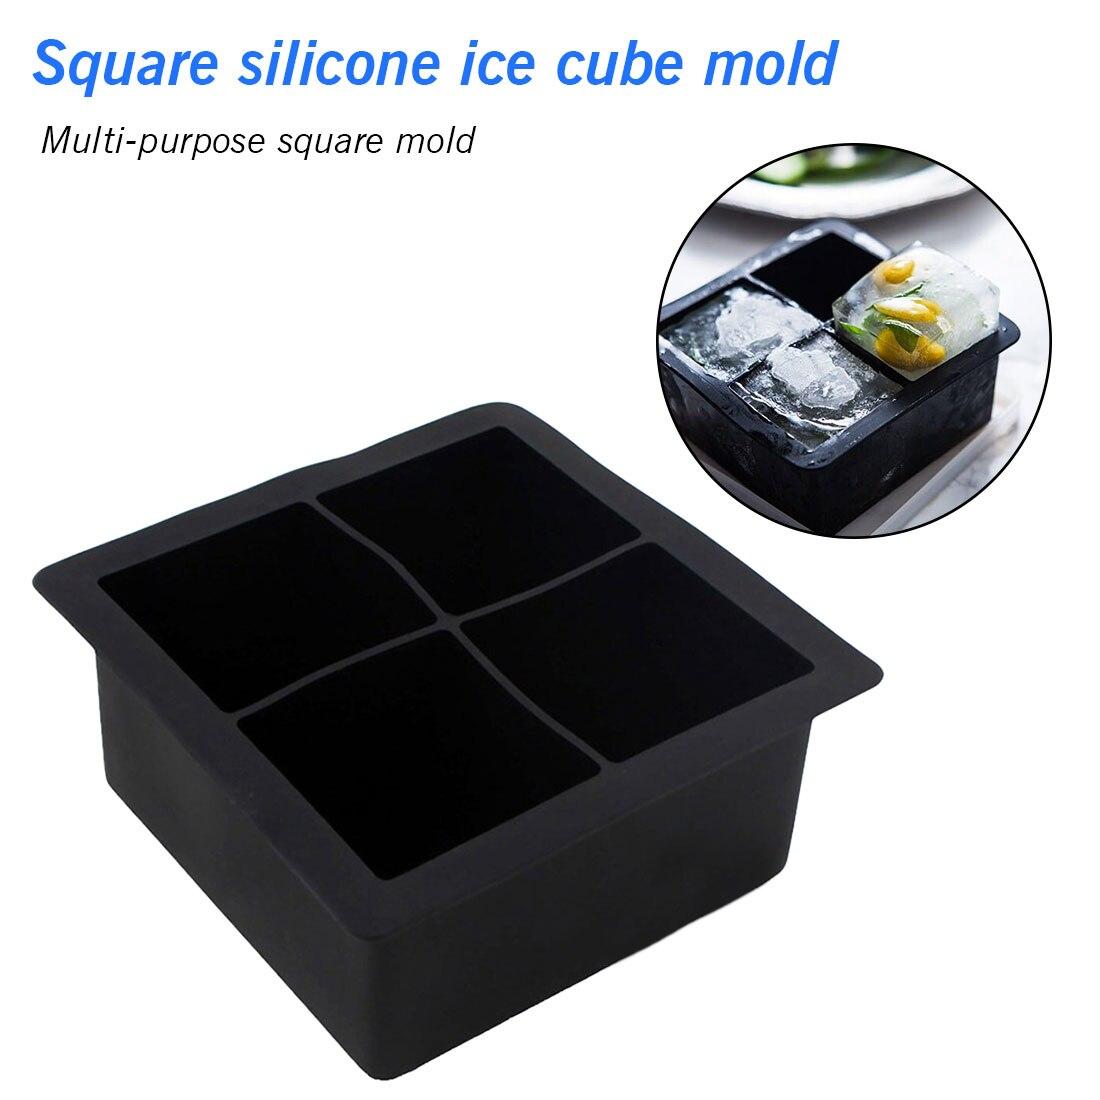 Big Giant//Jumbo Silicone Ice Cube Making Square Tray Mold //Mould Large King-Size